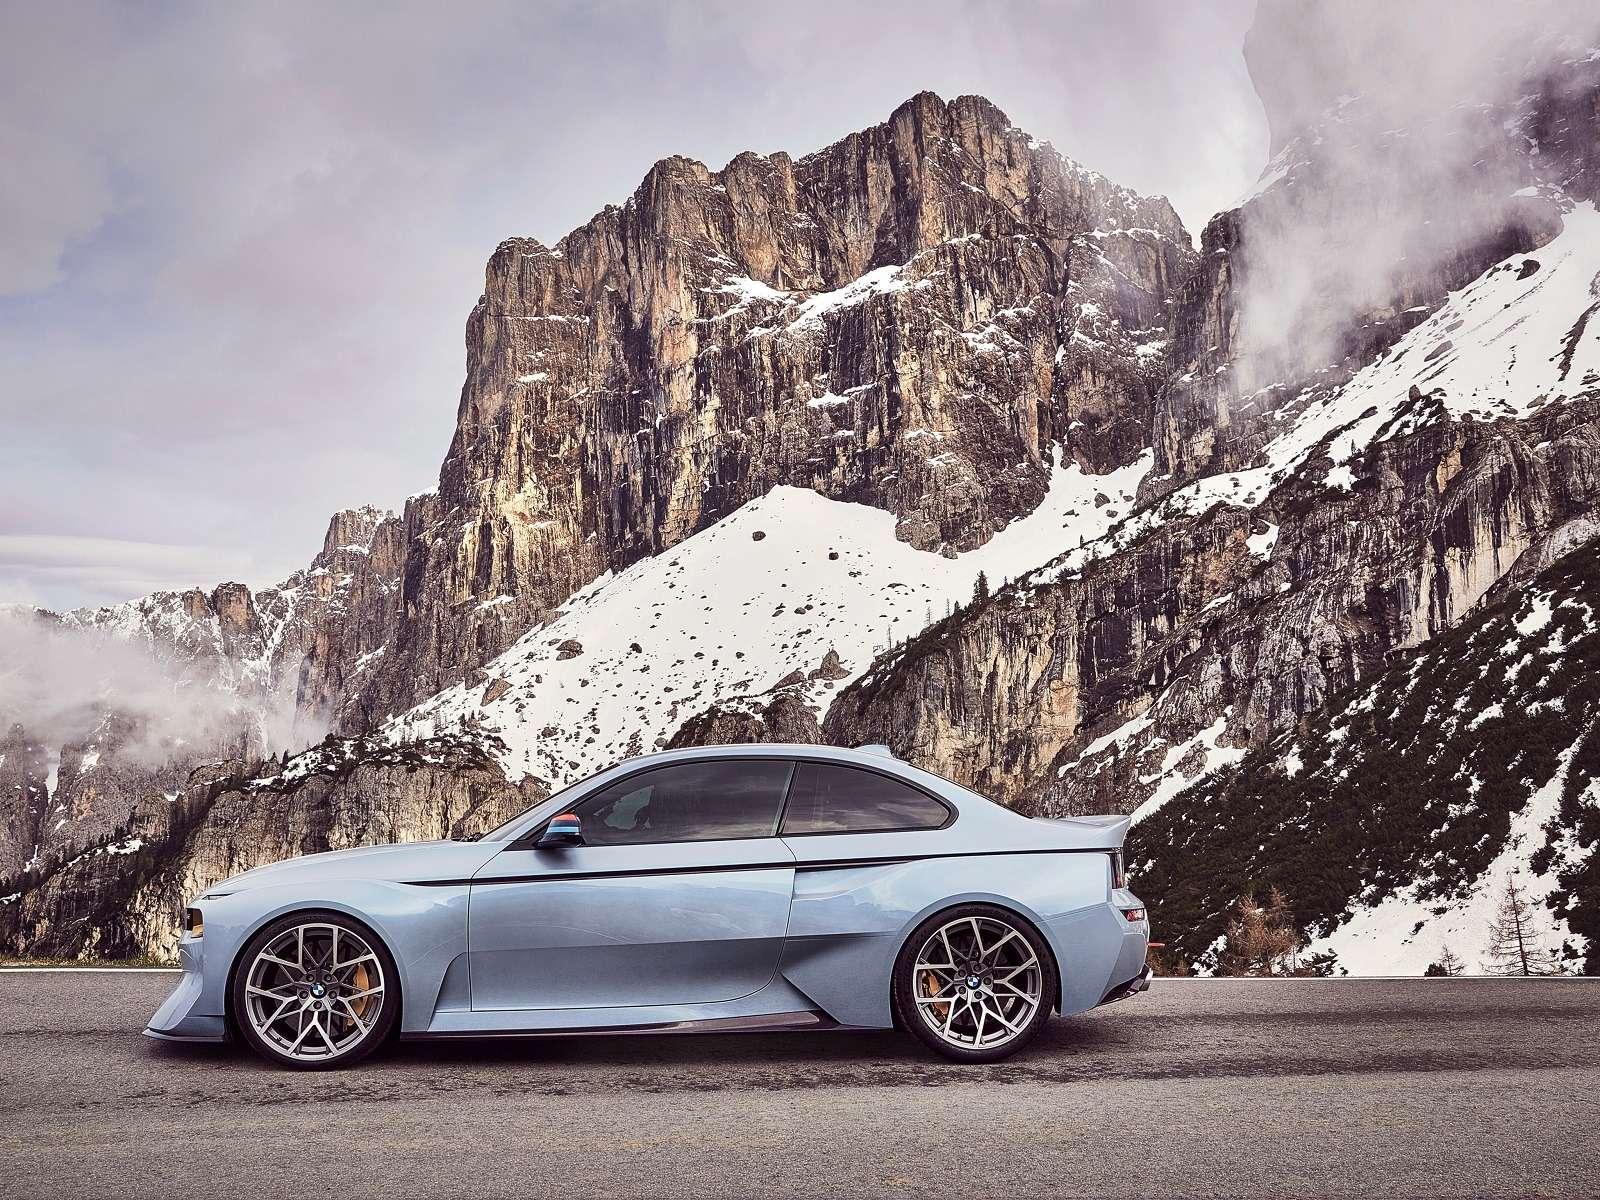 Иллюзия легенды: BMW поупражнялась натему 2002 turbo— фото 590507